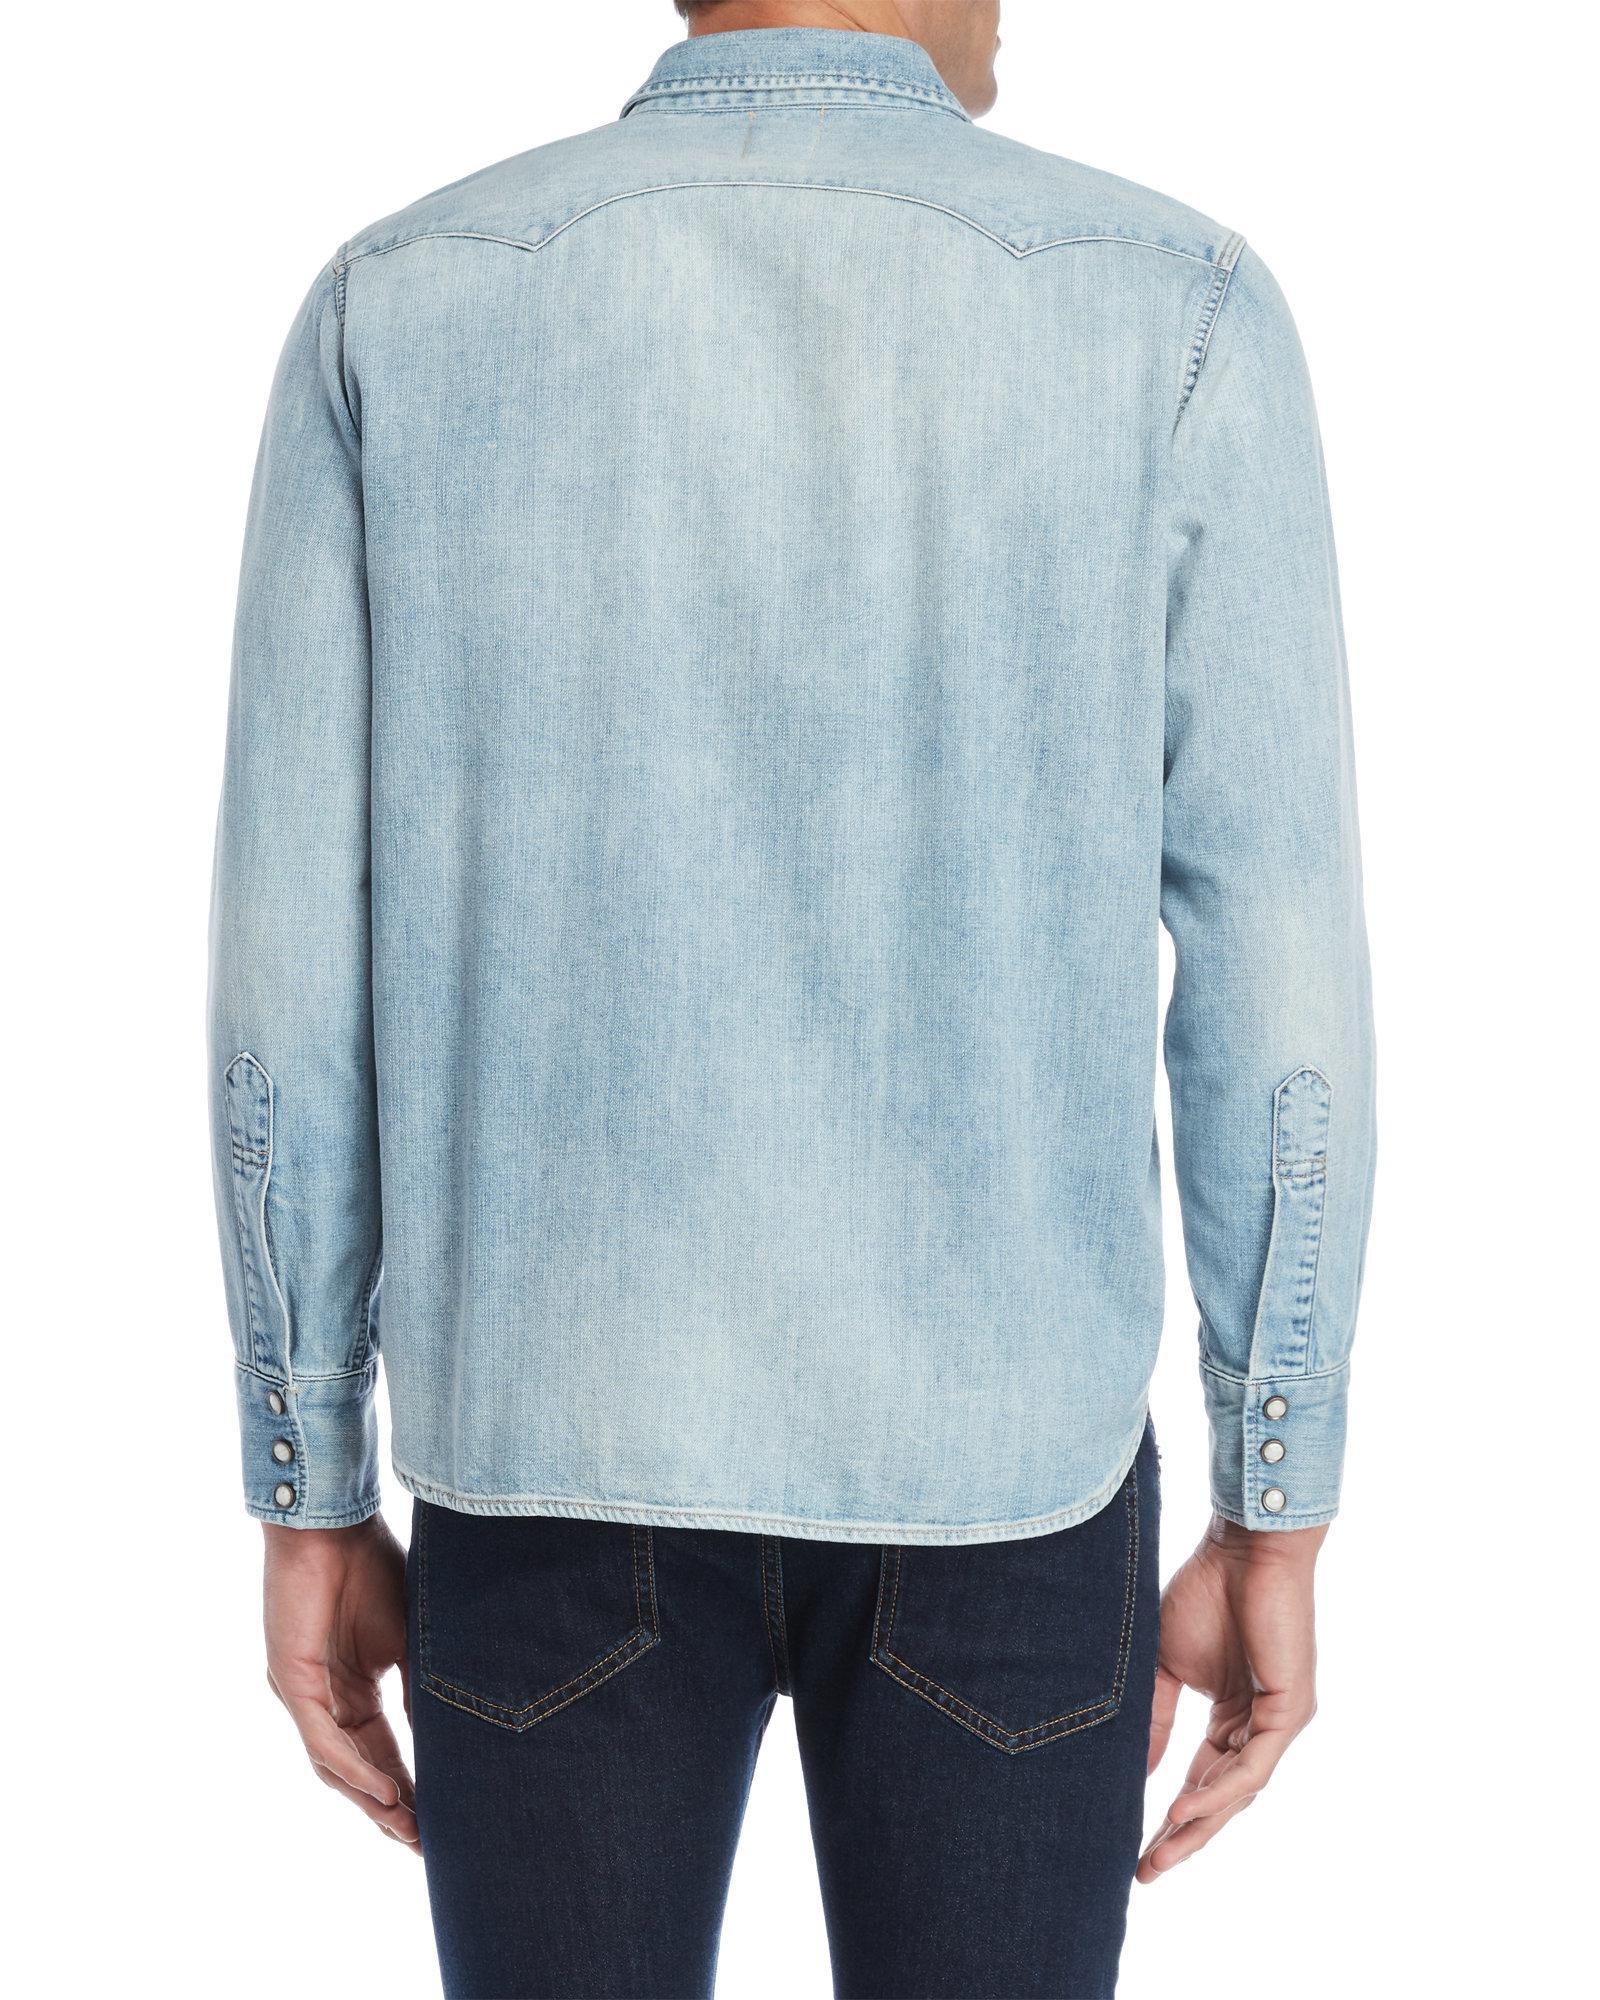 cbe1cc4ee0 Lyst - Levi s 1955 Sawtooth Western Denim Shirt in Blue for Men